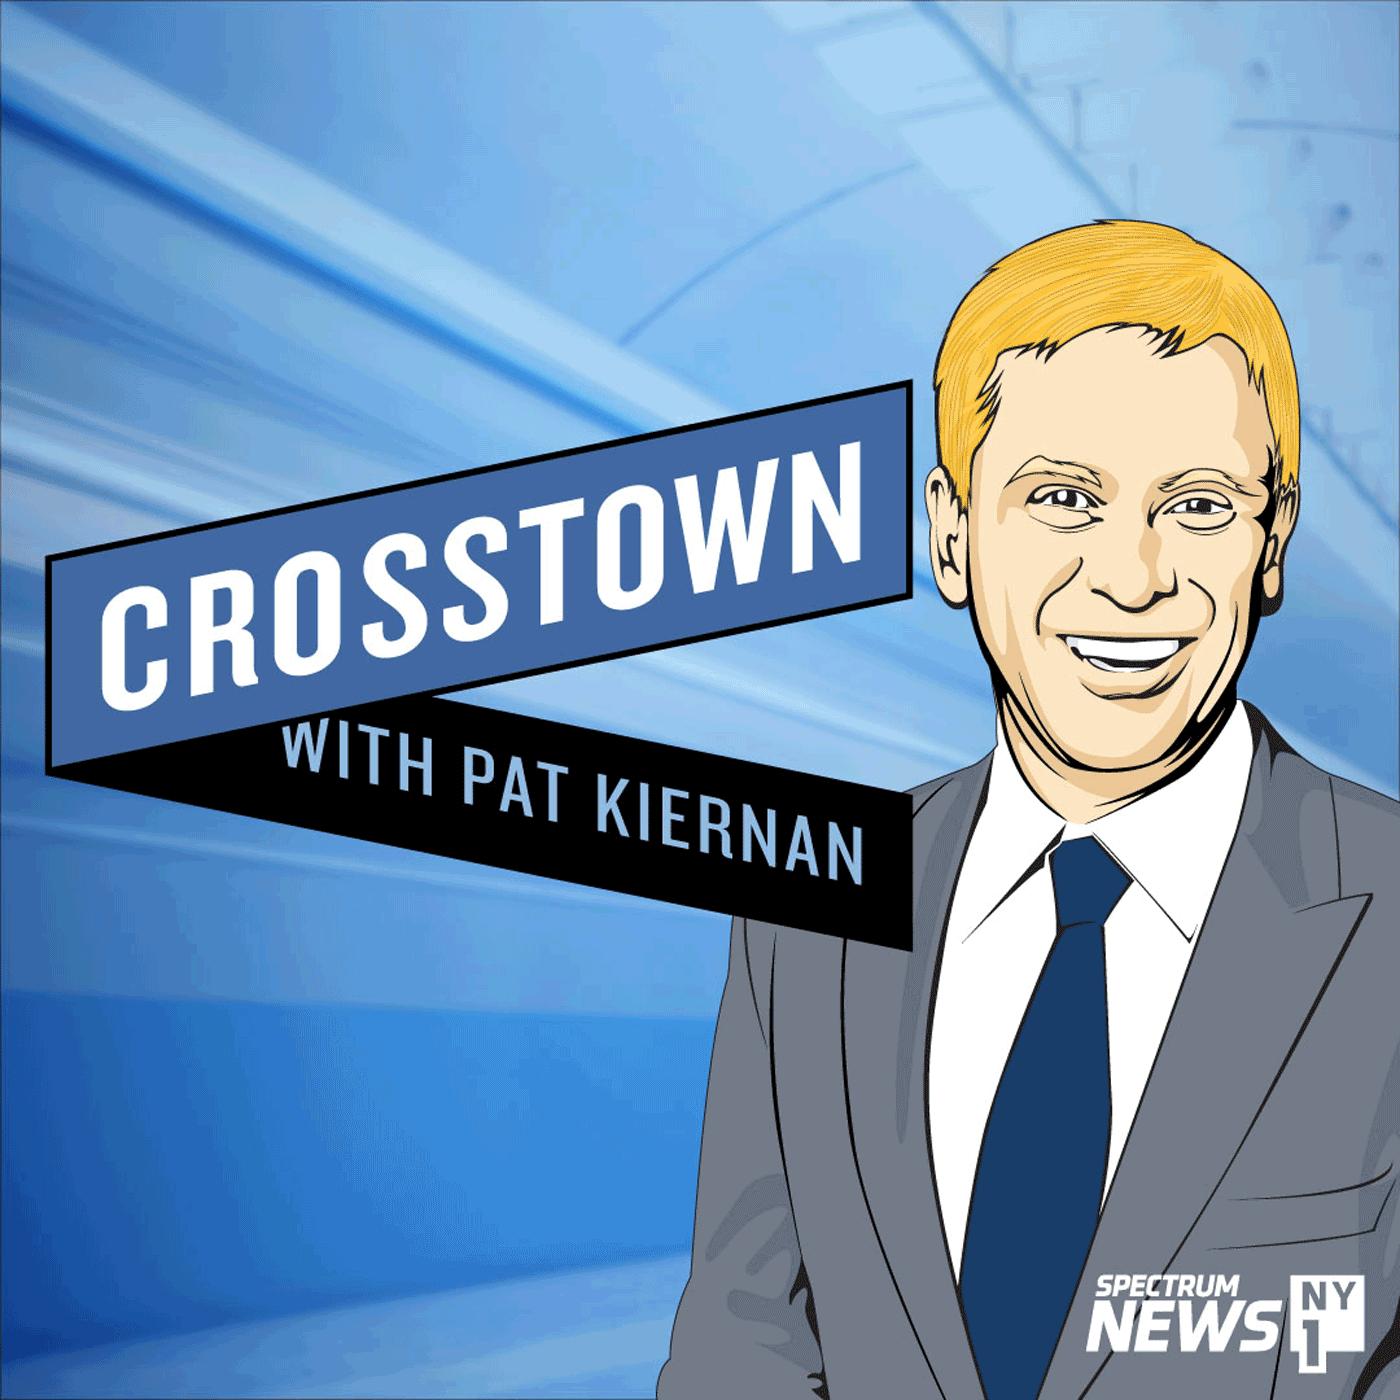 Crosstown with Pat Kiernan show art